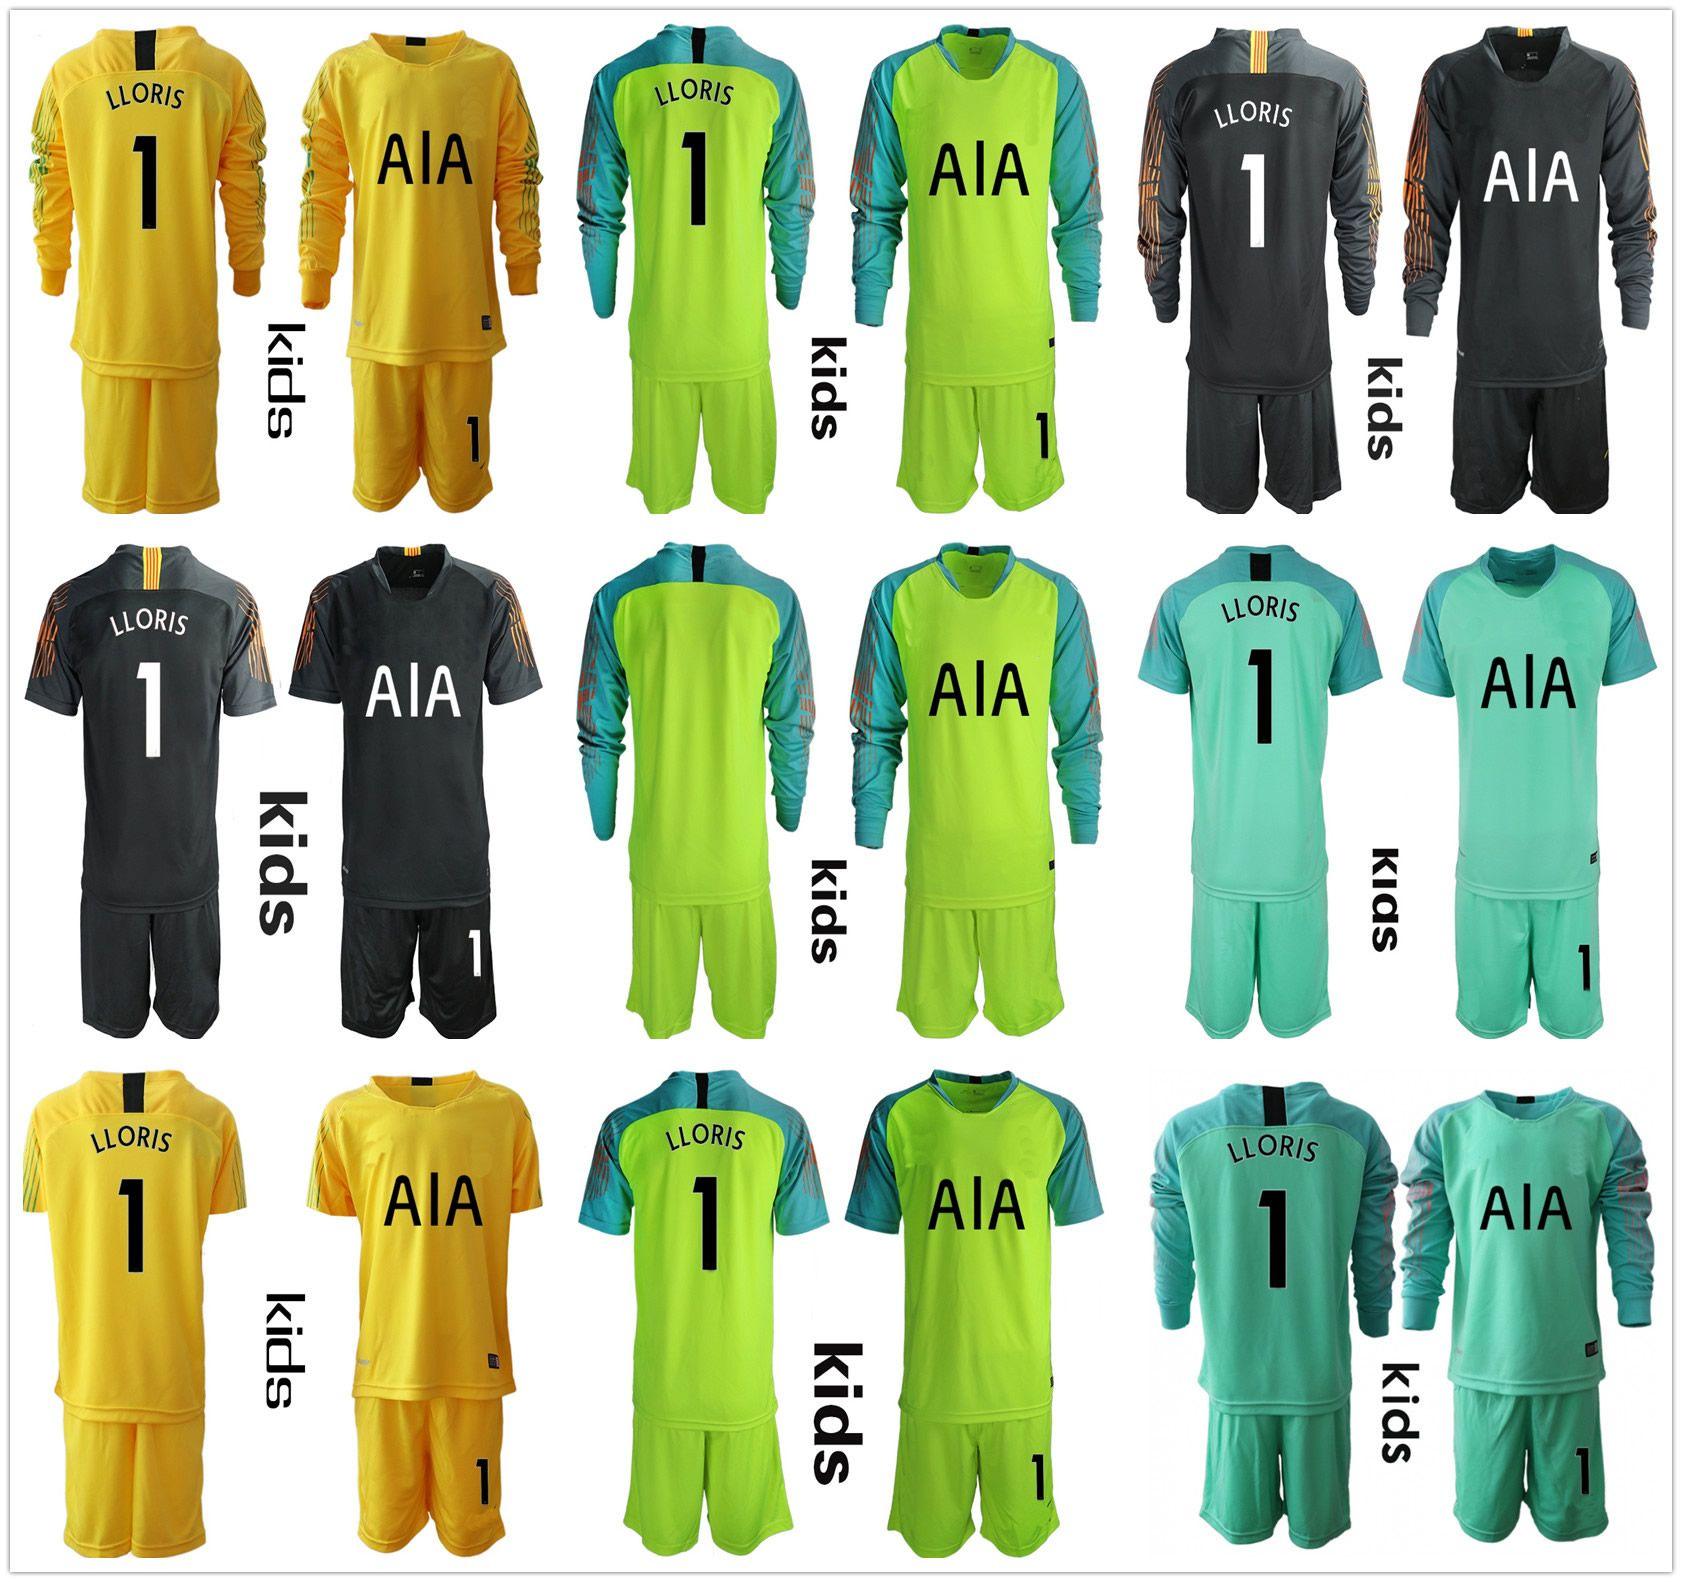 9286cfd29 2019 2018 2019 Kids Youth Long Sleeve Boys Goalie Hugo LLoris Goalkeeper  Jersey Kid Soccer Set Children #1 Lloris Uniform Football Kit Sets From  Fanshomed2, ...